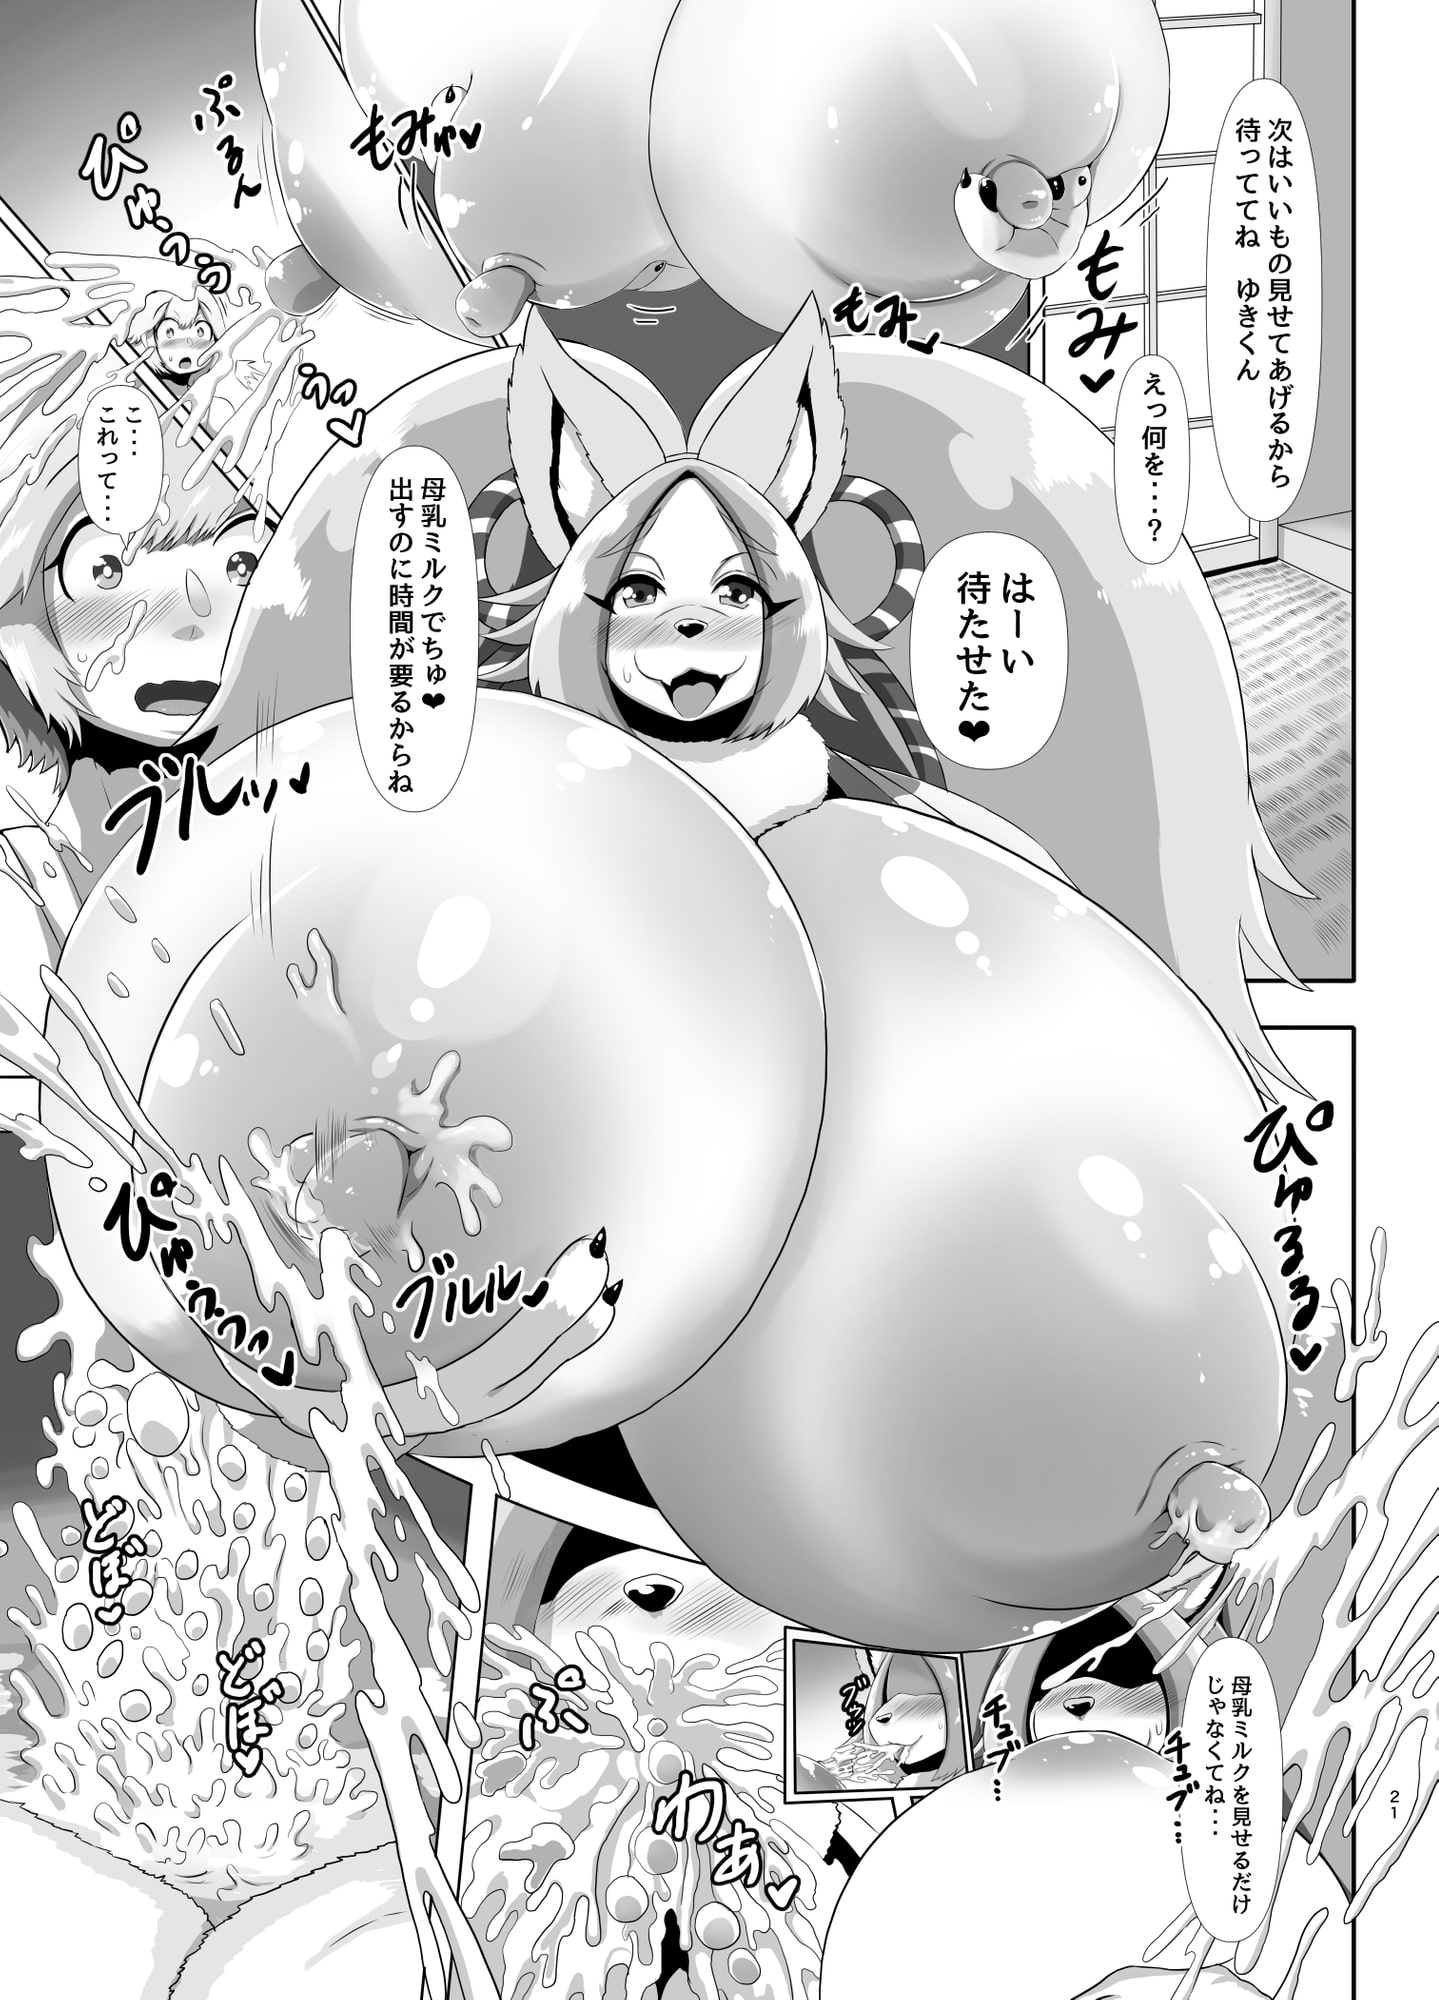 RJ321104 デカ爆乳チワワ巫女出会い編 [20210320]